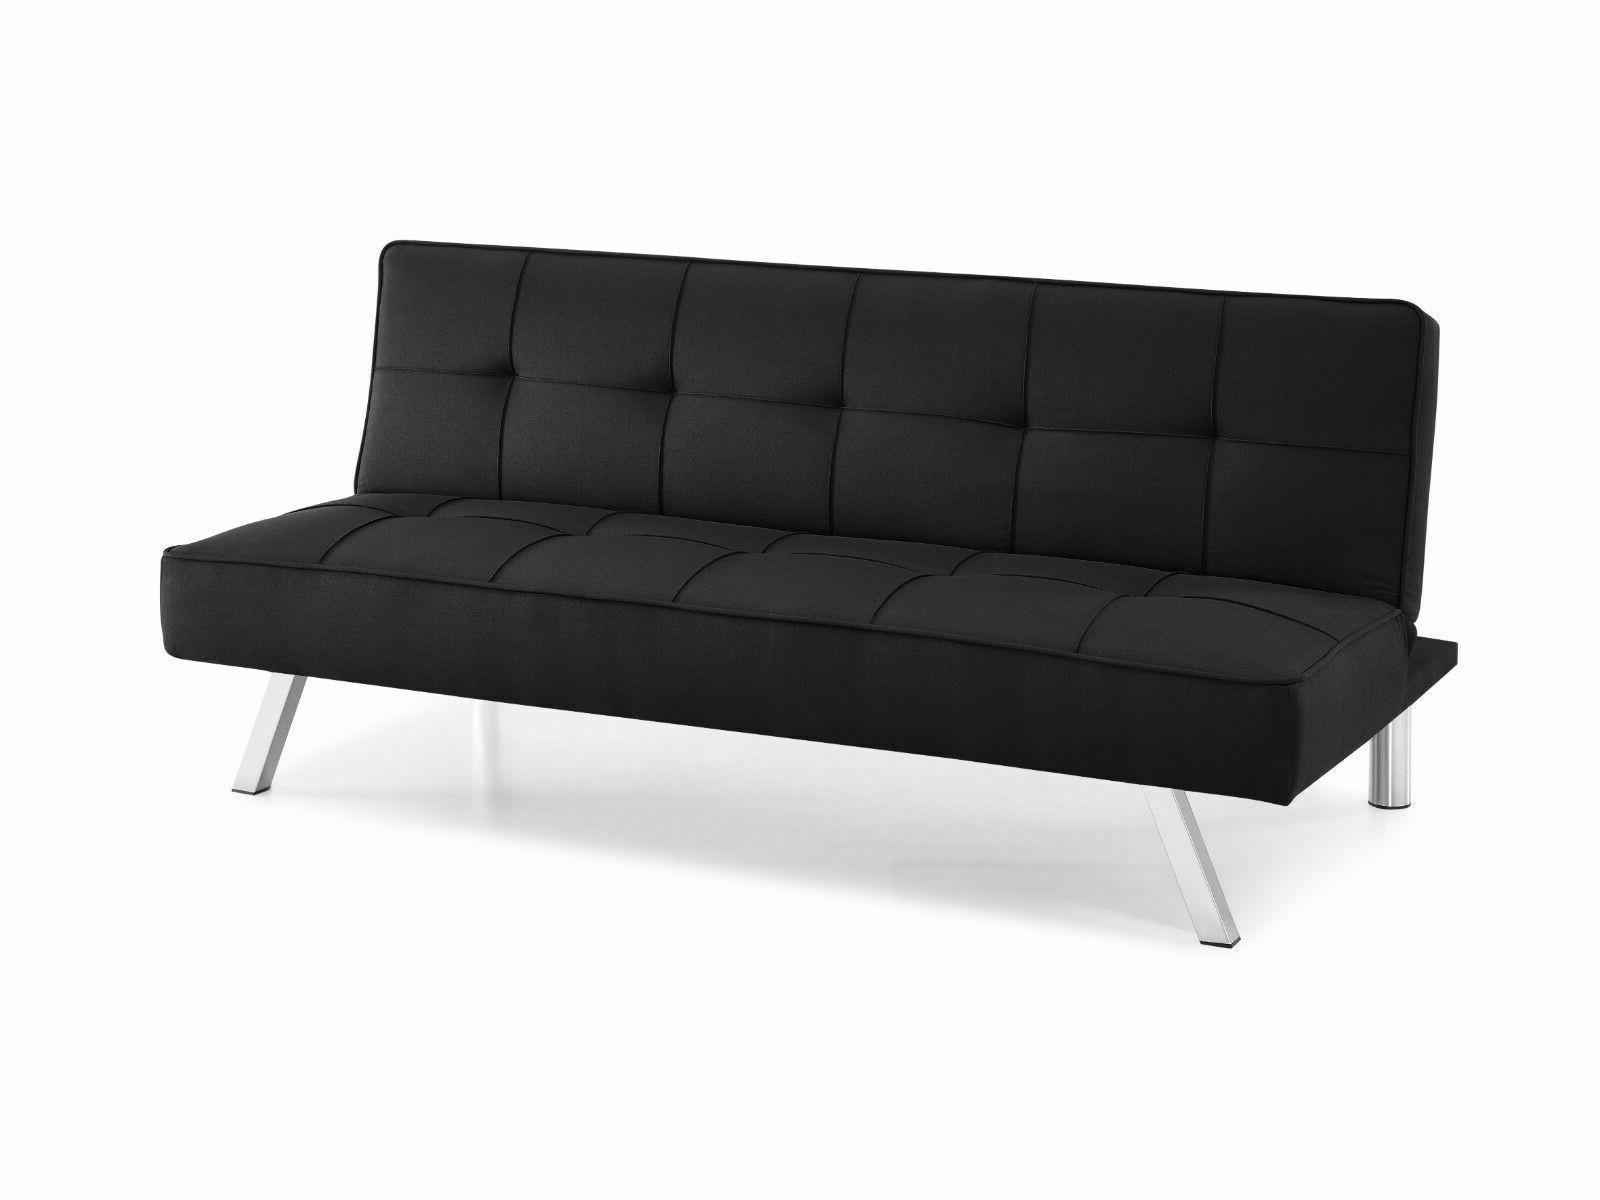 Futon Couch 3 Full Black